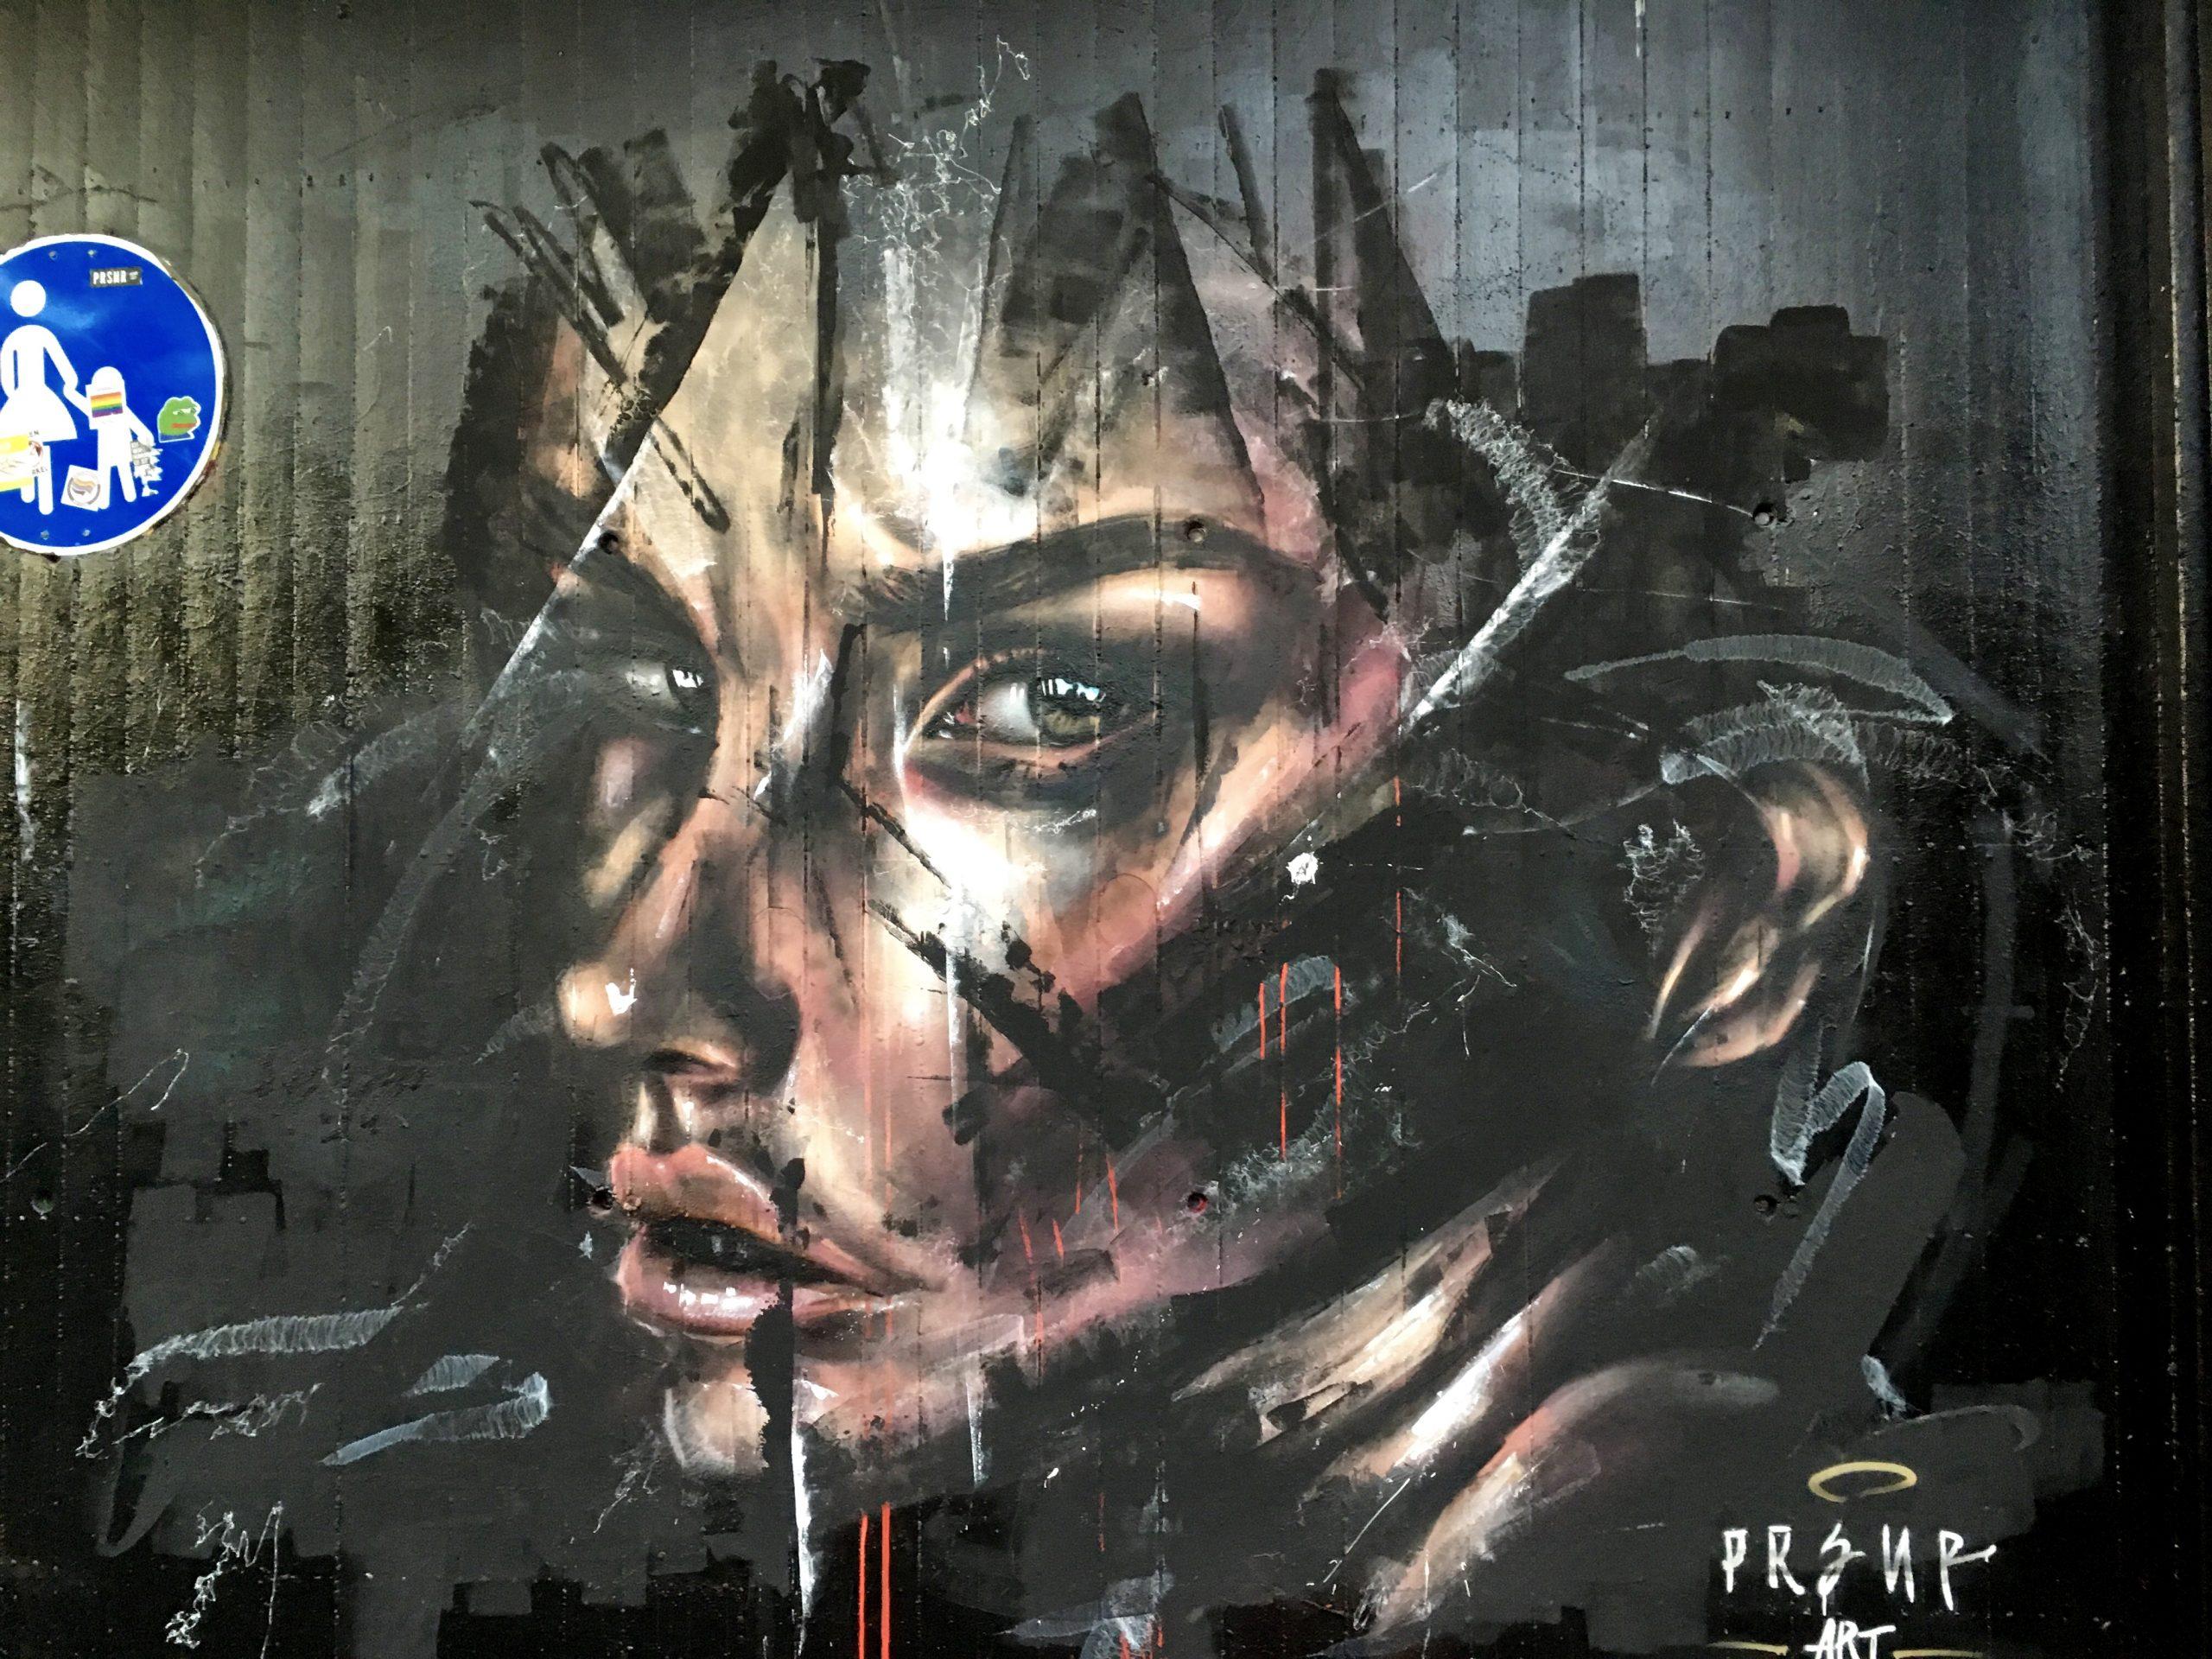 PRSNR | GRAFFITIPARK AM SCHLOSS MANNHEIM (leider übermalt)